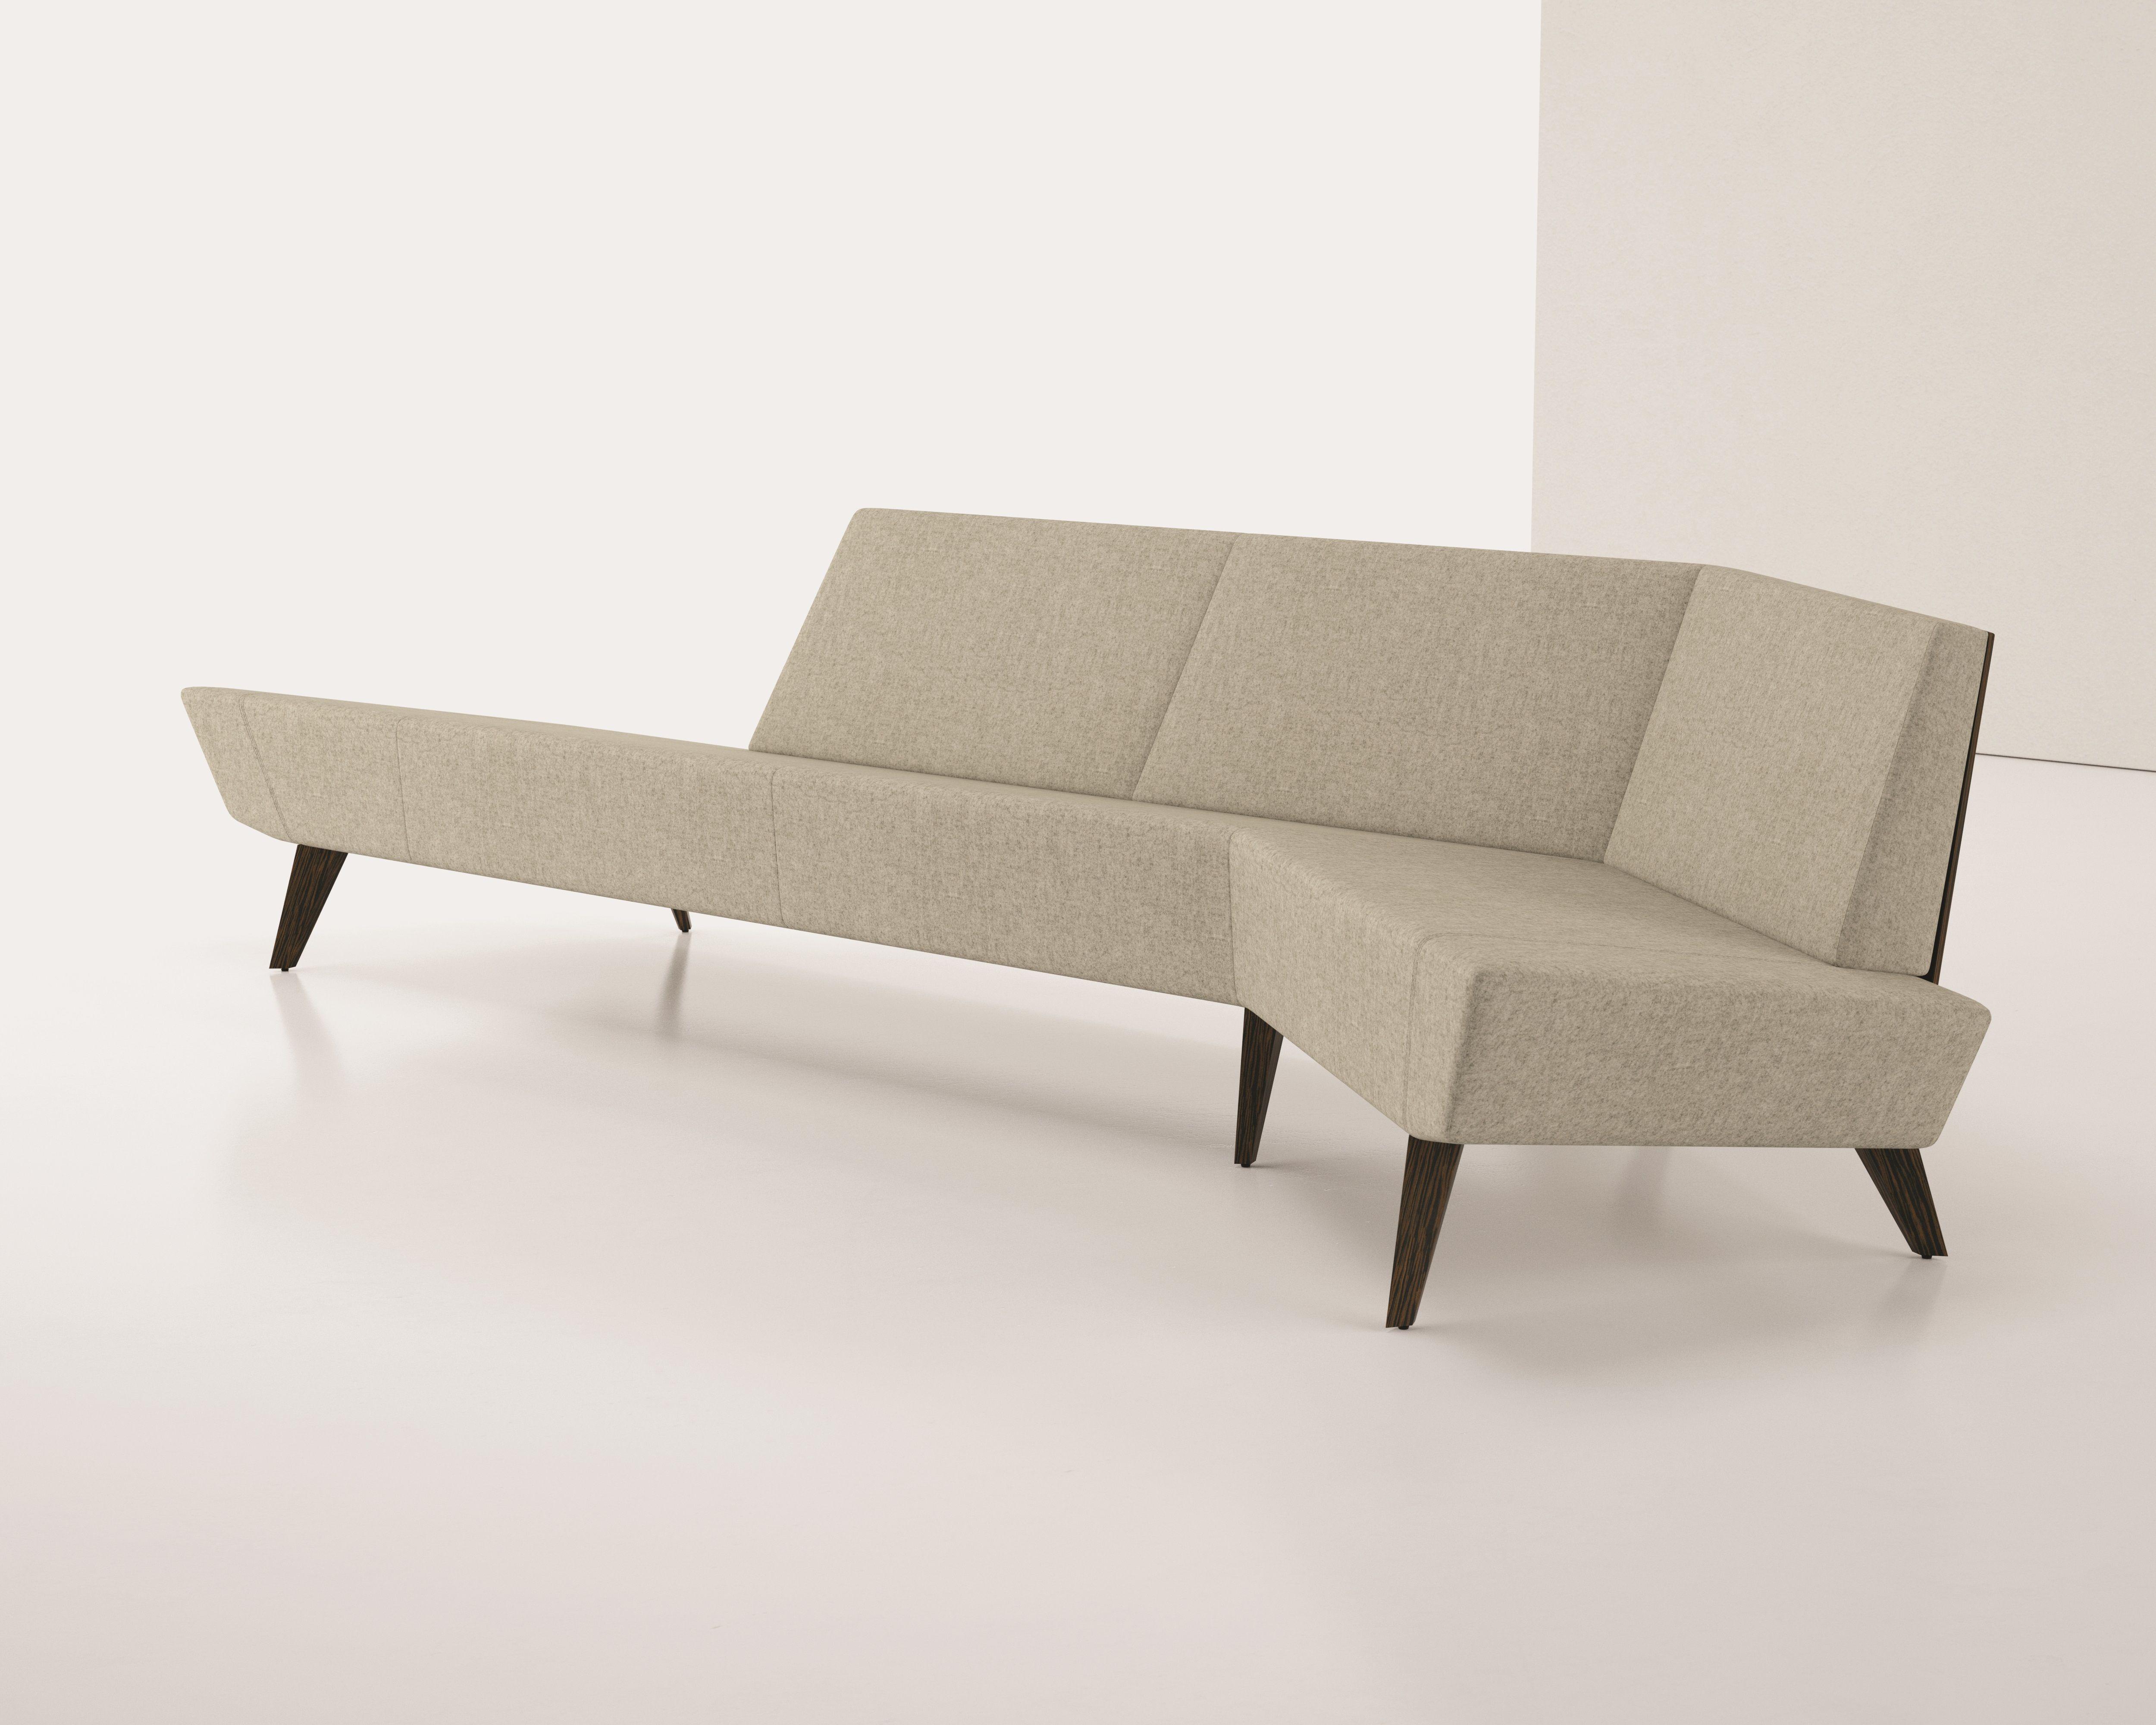 VT TS520UL Avant Angled Sofa, Left Upholstered Back